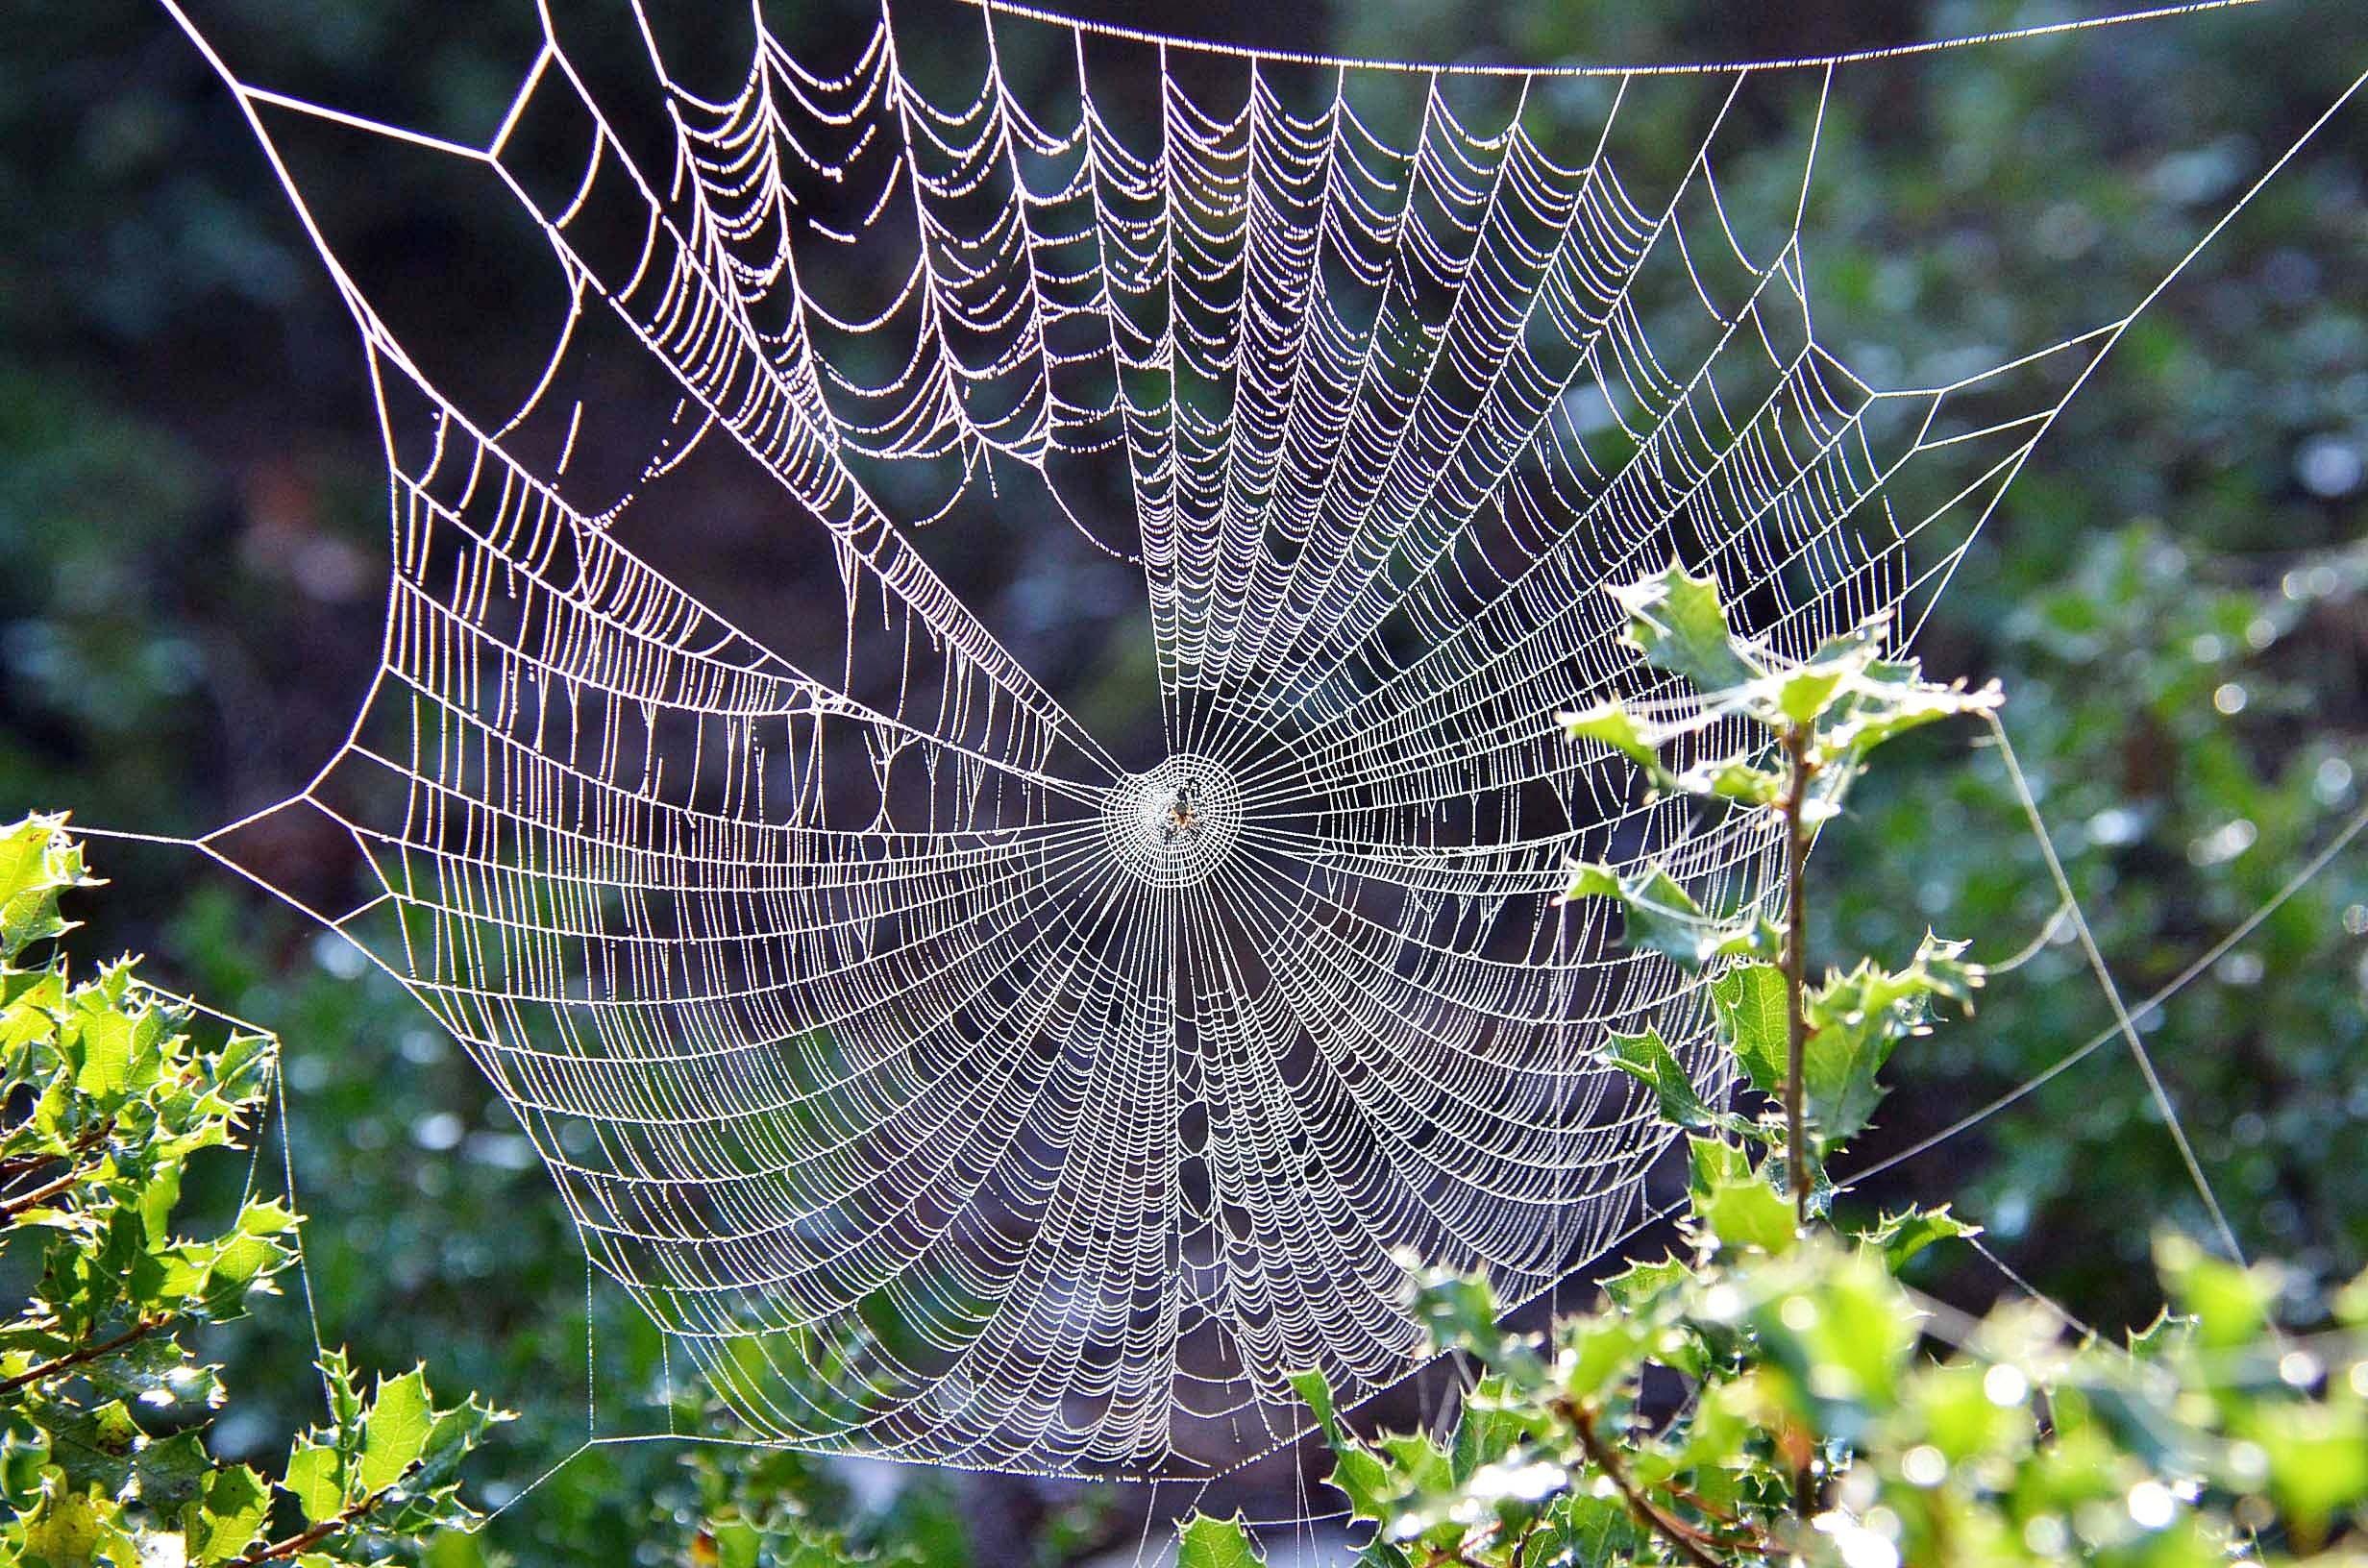 Spider Web Beside Leafed Plant